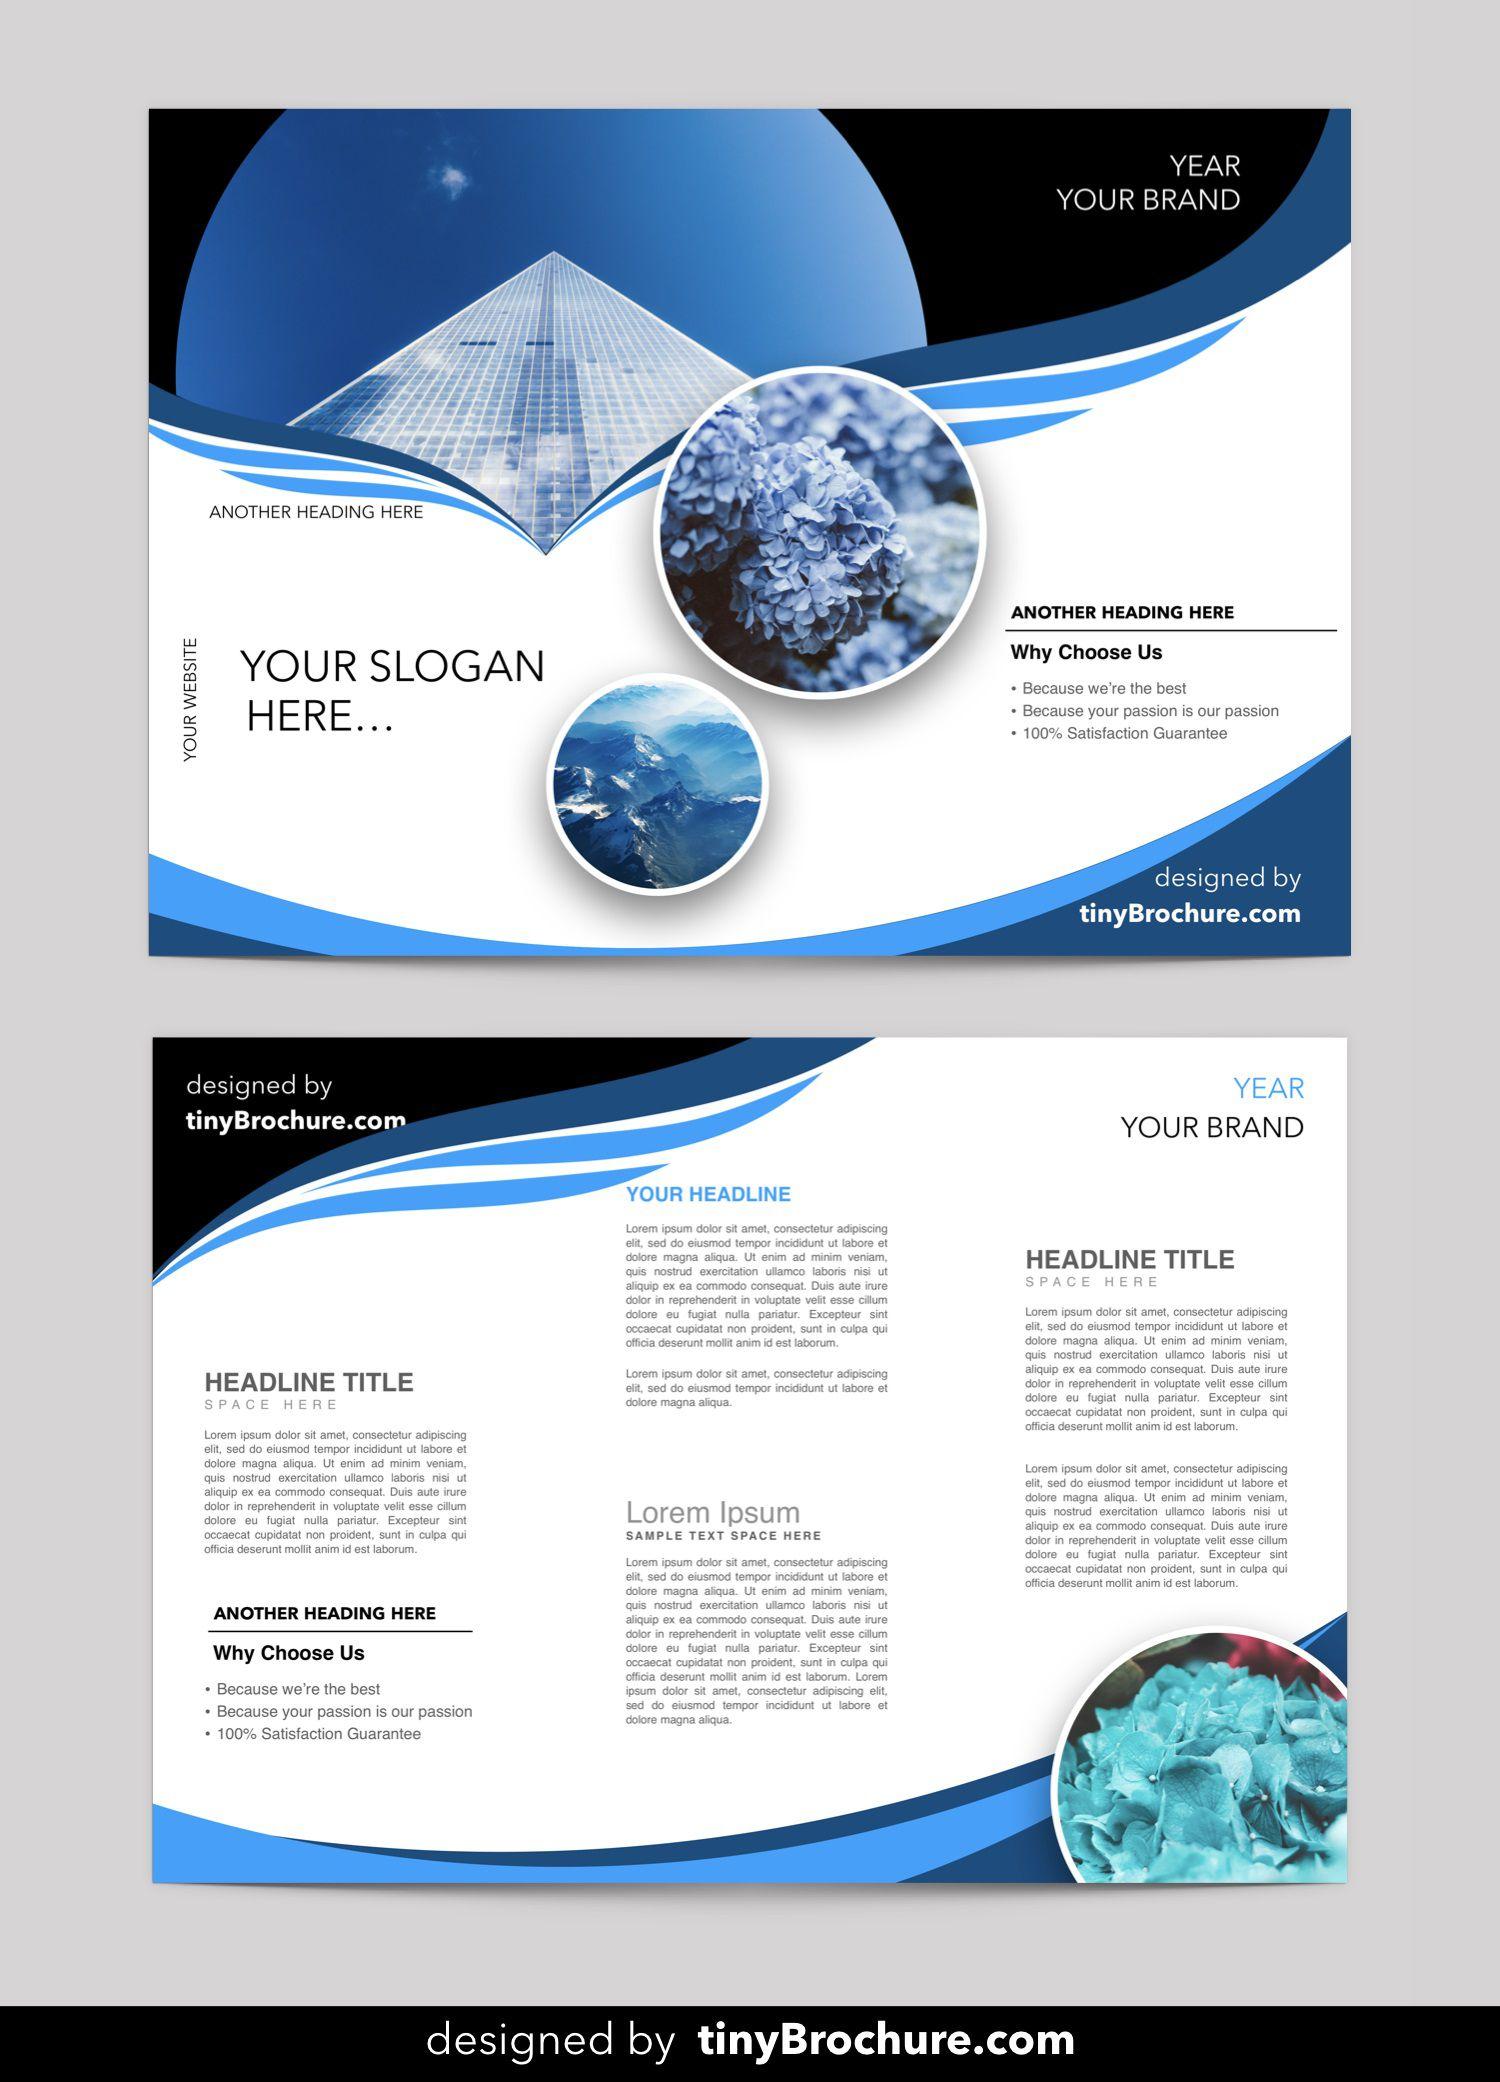 003 Wondrou Microsoft Word Brochure Template Inspiration  M Free Download Design 2007 A4Full